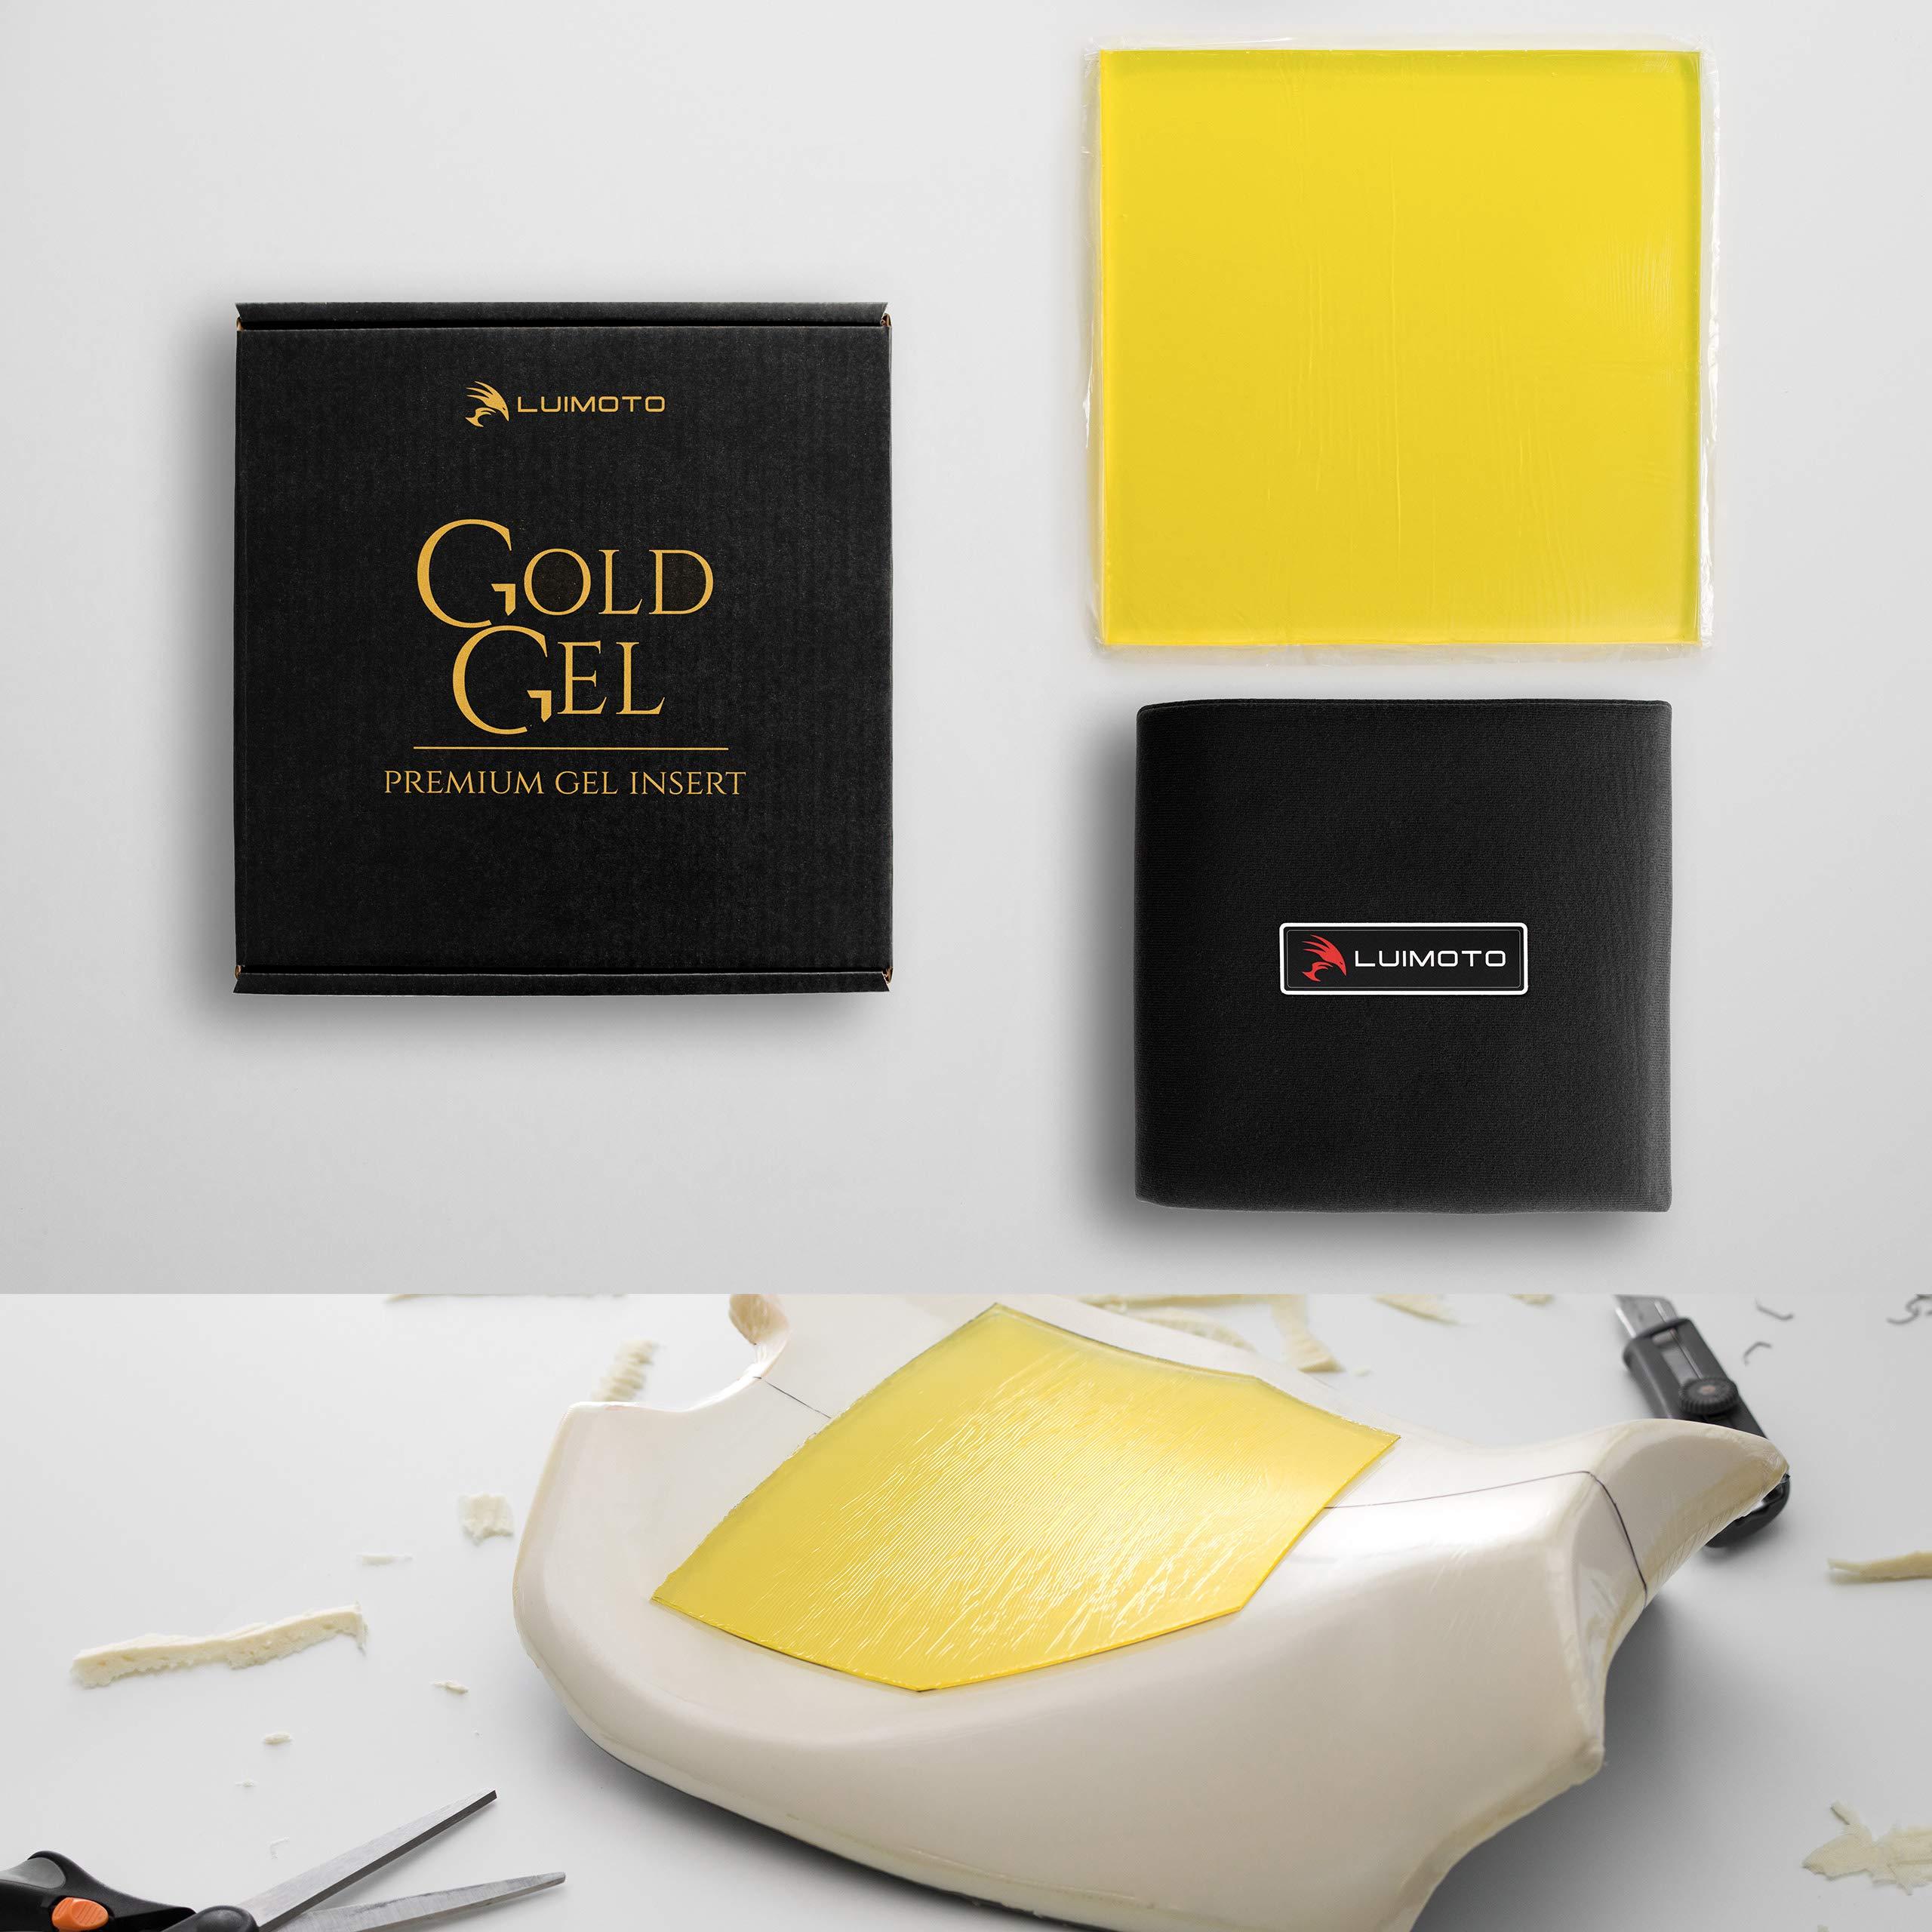 GOLD GEL by Luimoto. Premium Motorcycle Seat Gel Pad Insert, Increase rider comfort Universal Fit (Rider Seat Kit GG1)